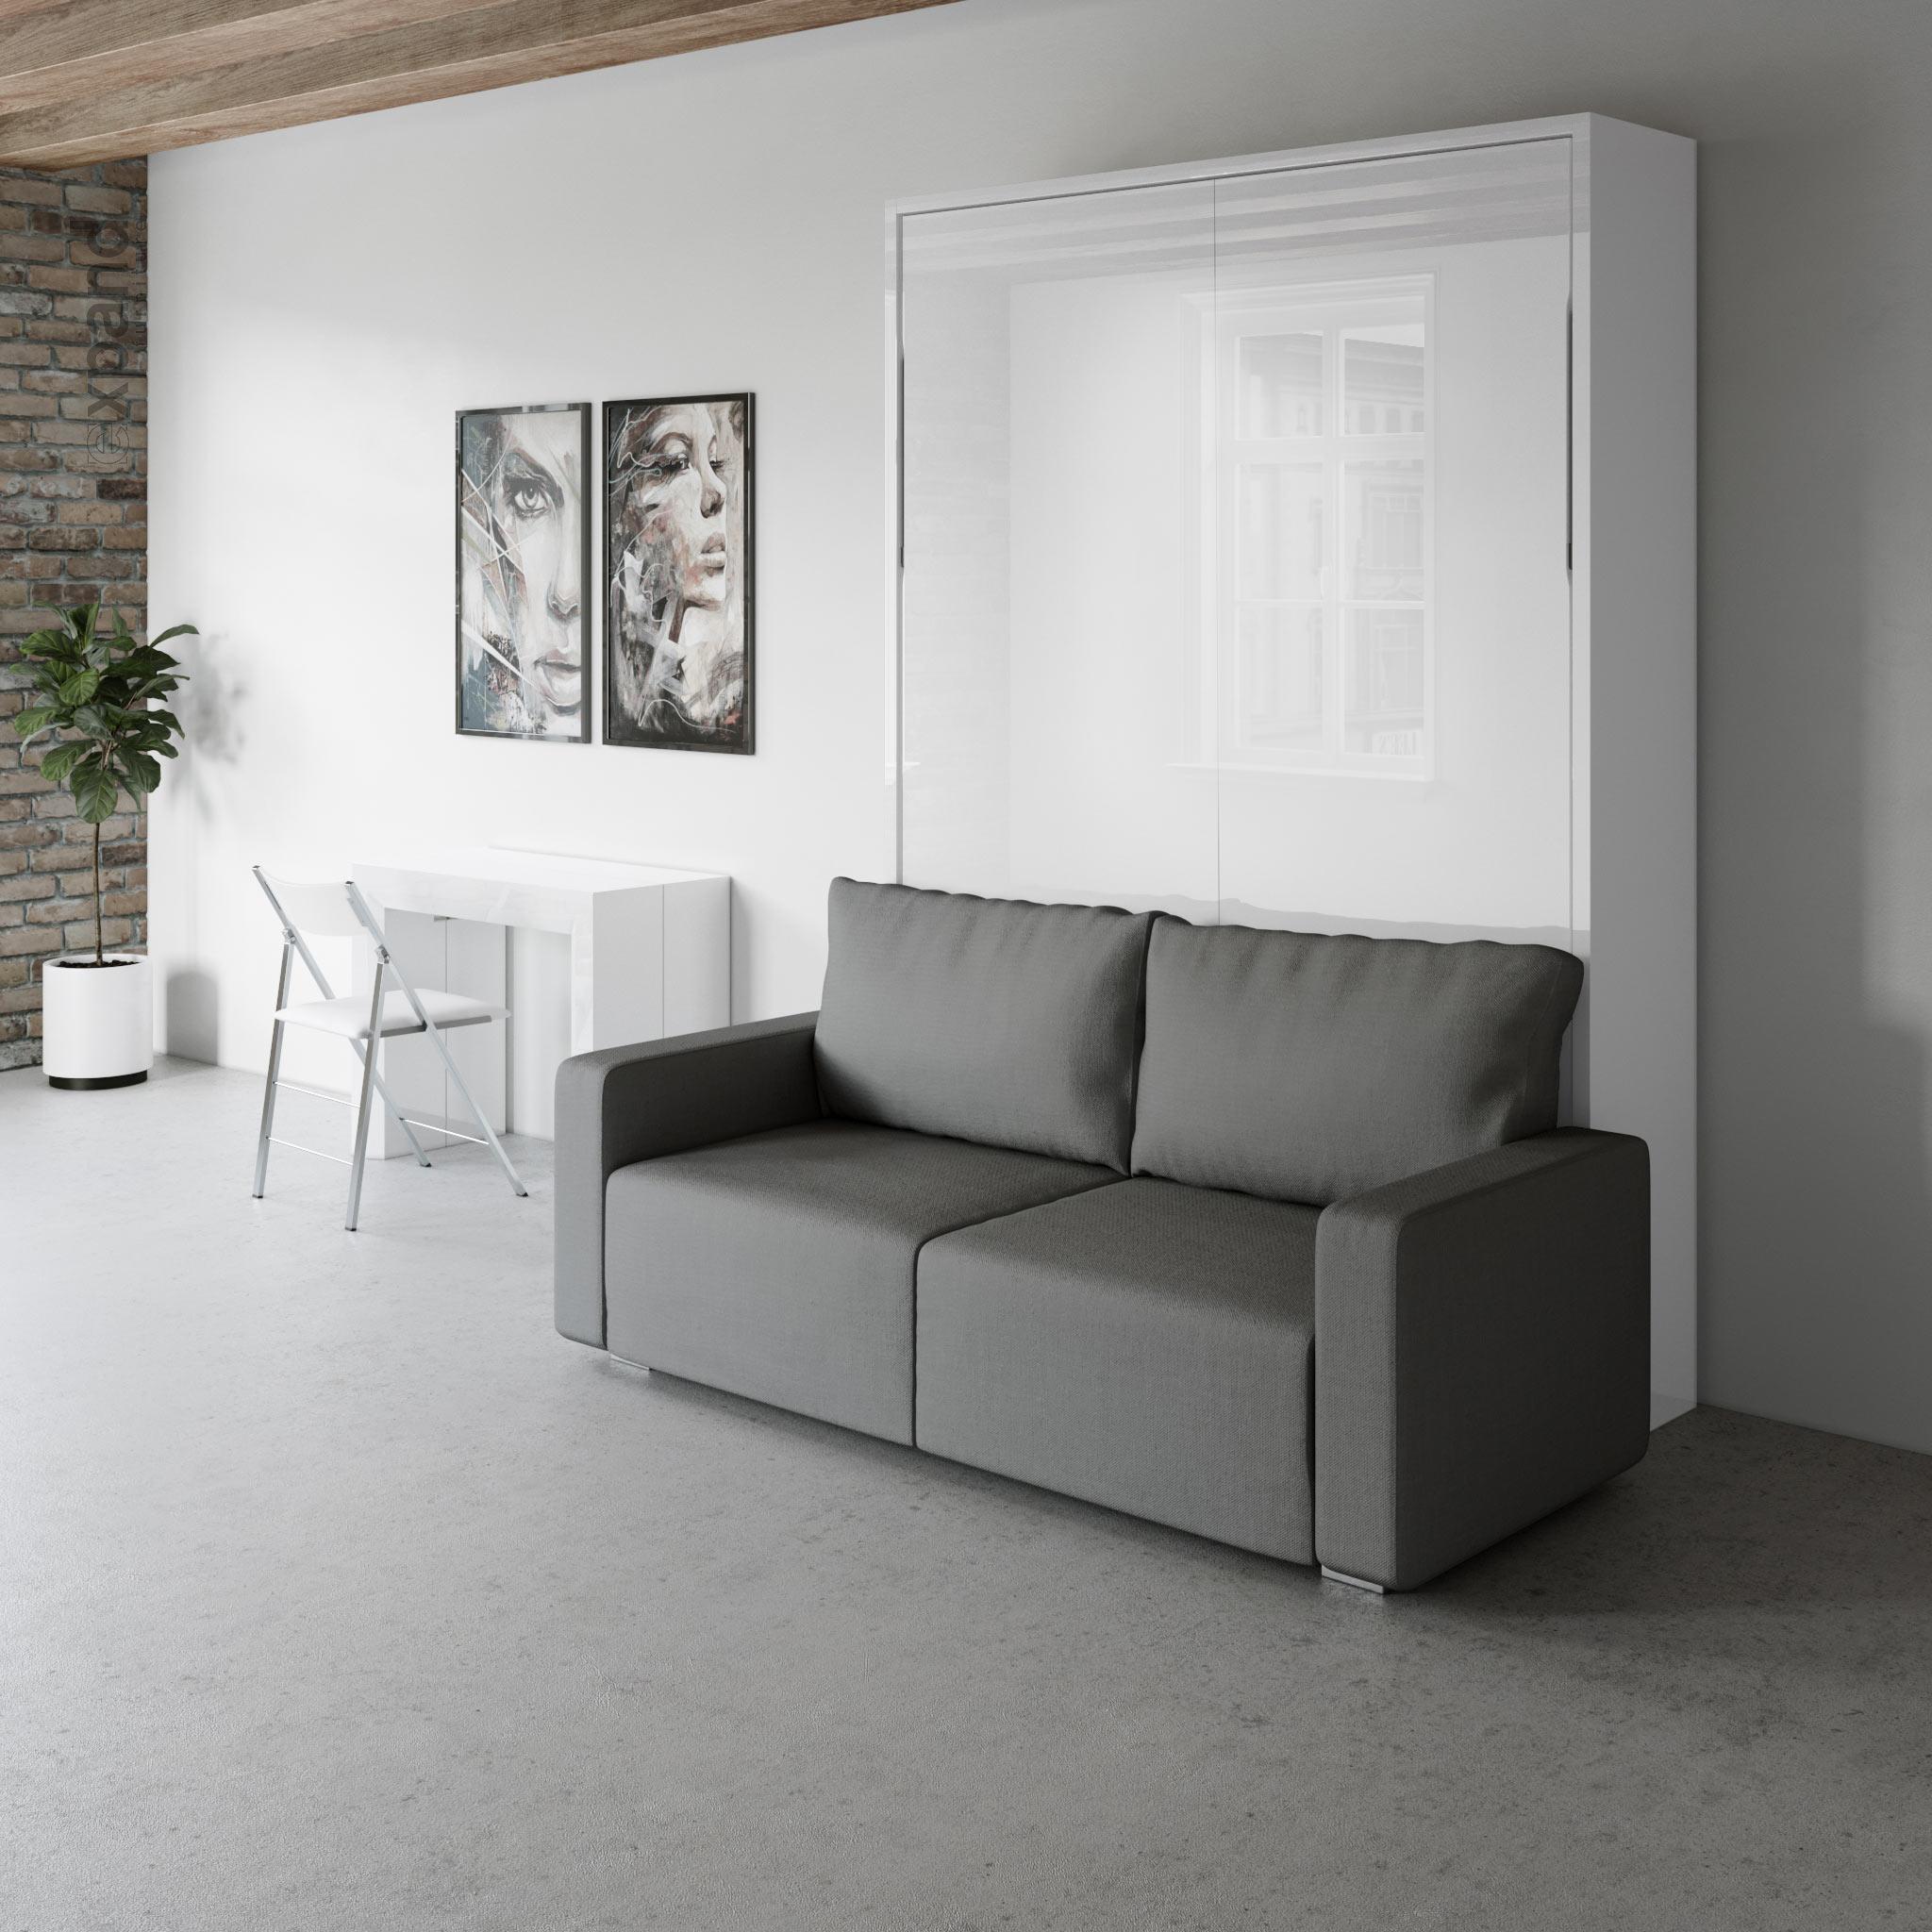 Sofa Set Cleaning: MurphySofa - Clean